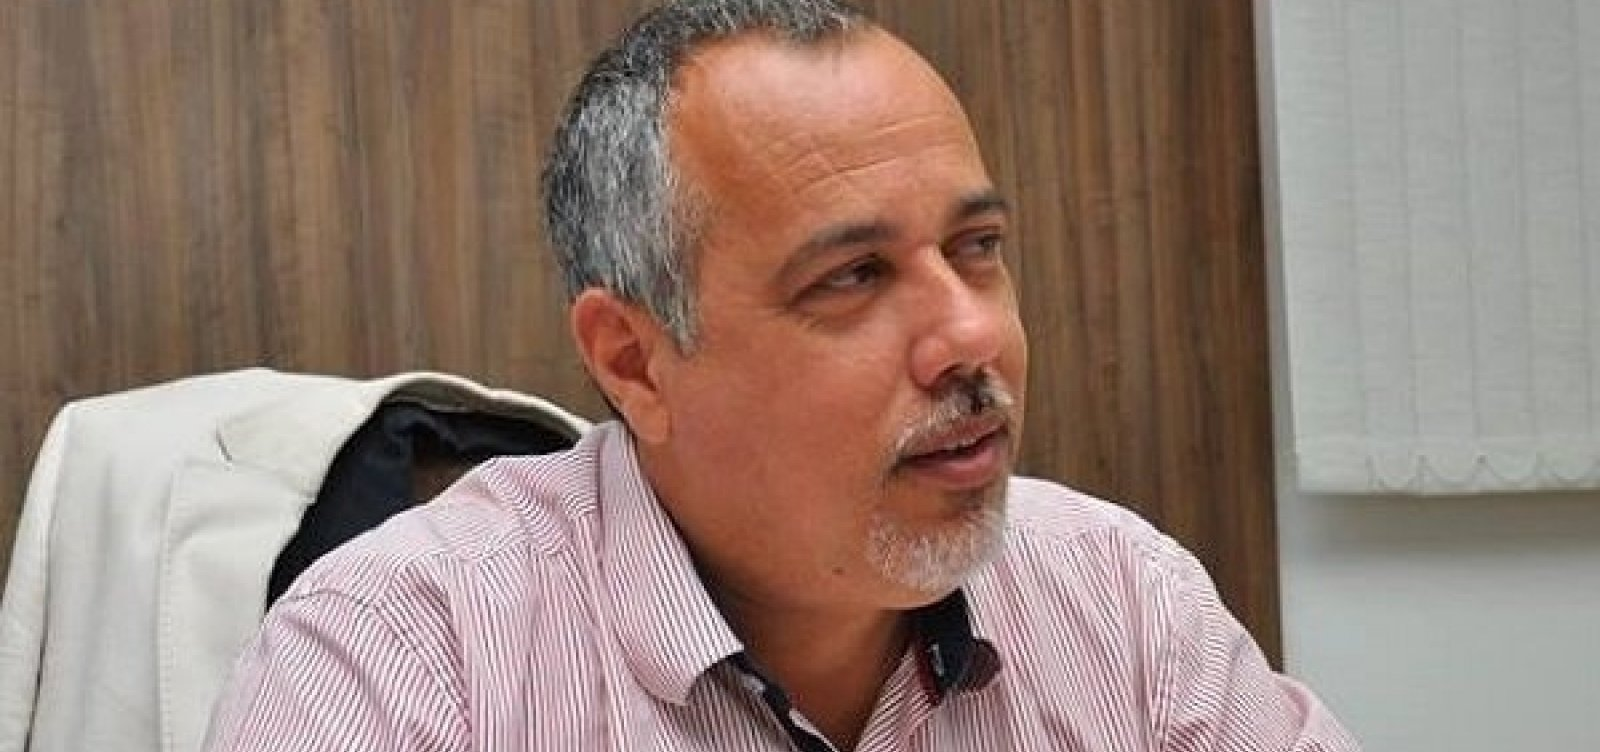 [TCM multa ex-prefeito de Lauro de Freitas]